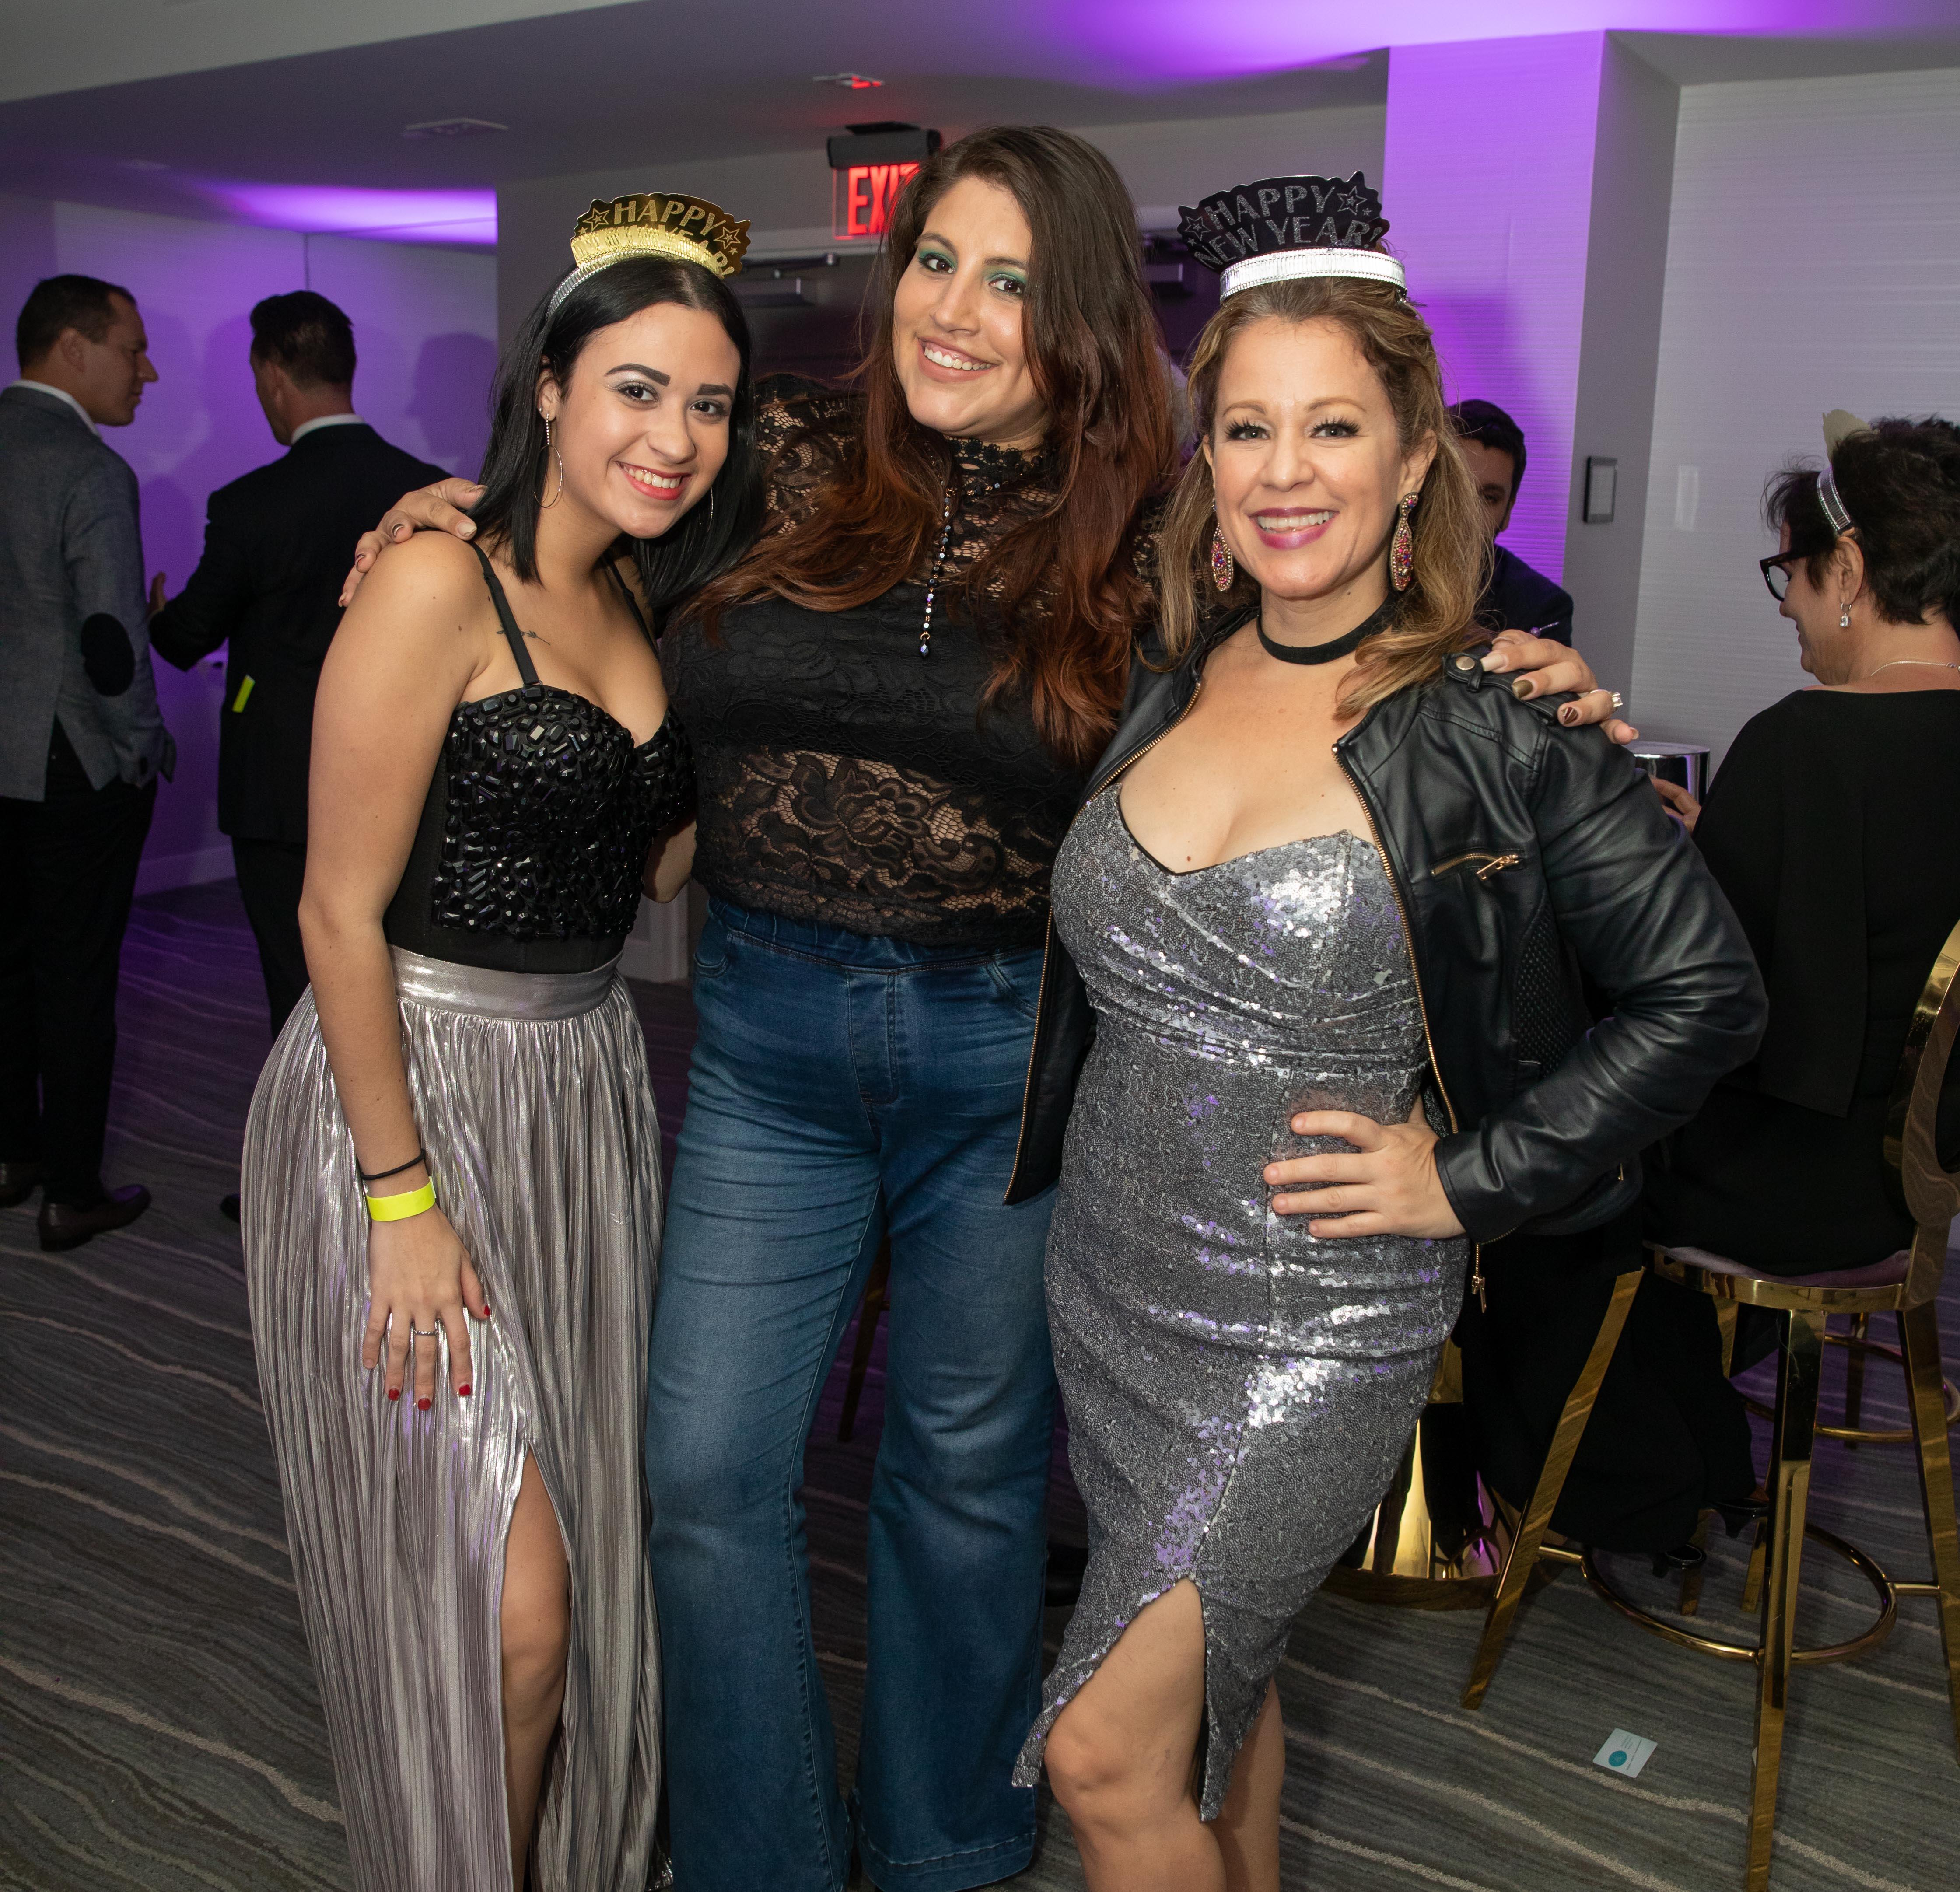 Natalie Abreu, Staphanie Laboy y Melisa Meléndez. (Suministrada)